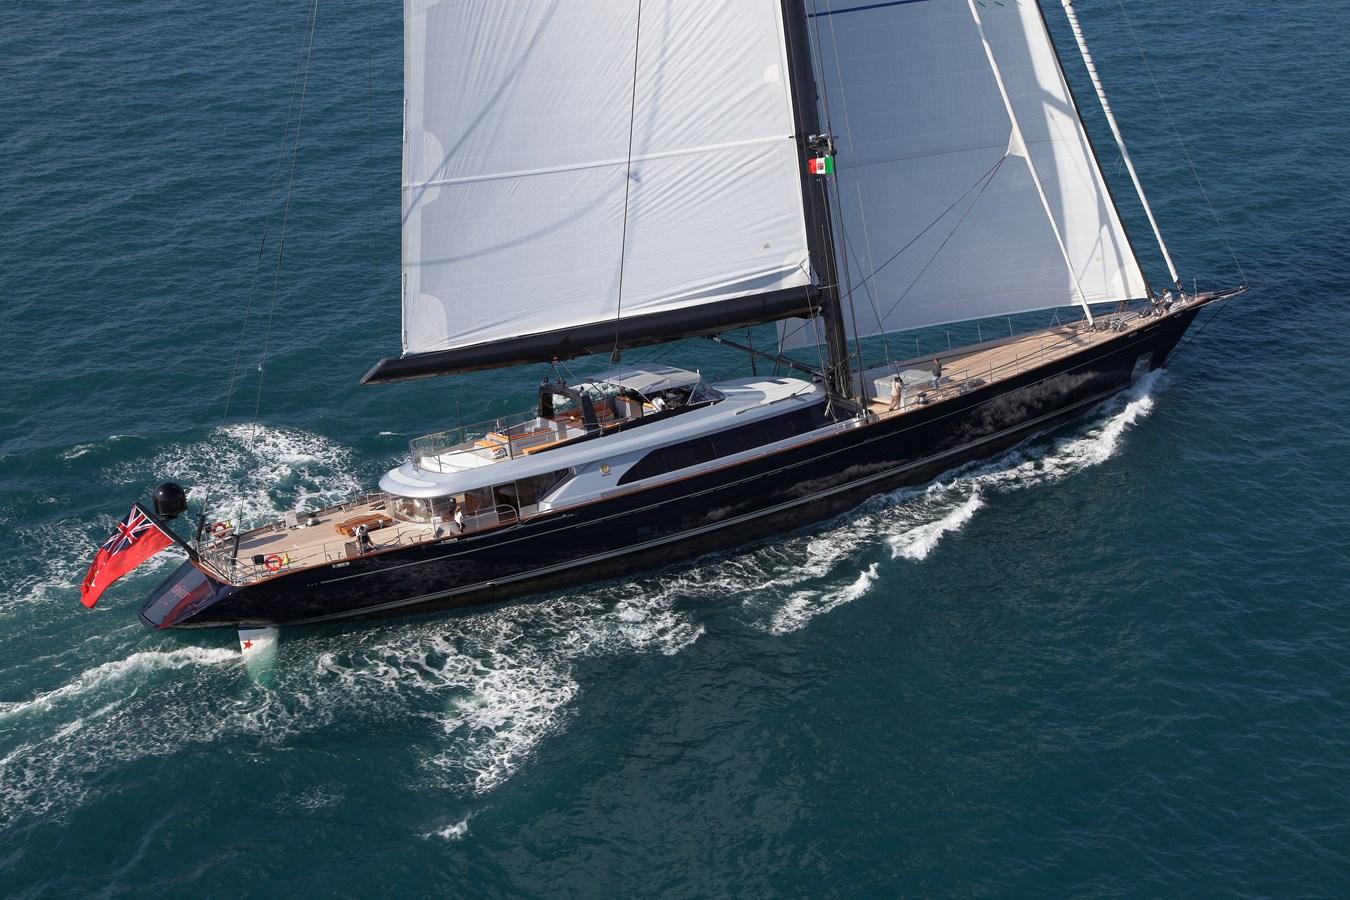 IMG_79961 2015 PERINI NAVI  Cruising/Racing Sailboat 2915452